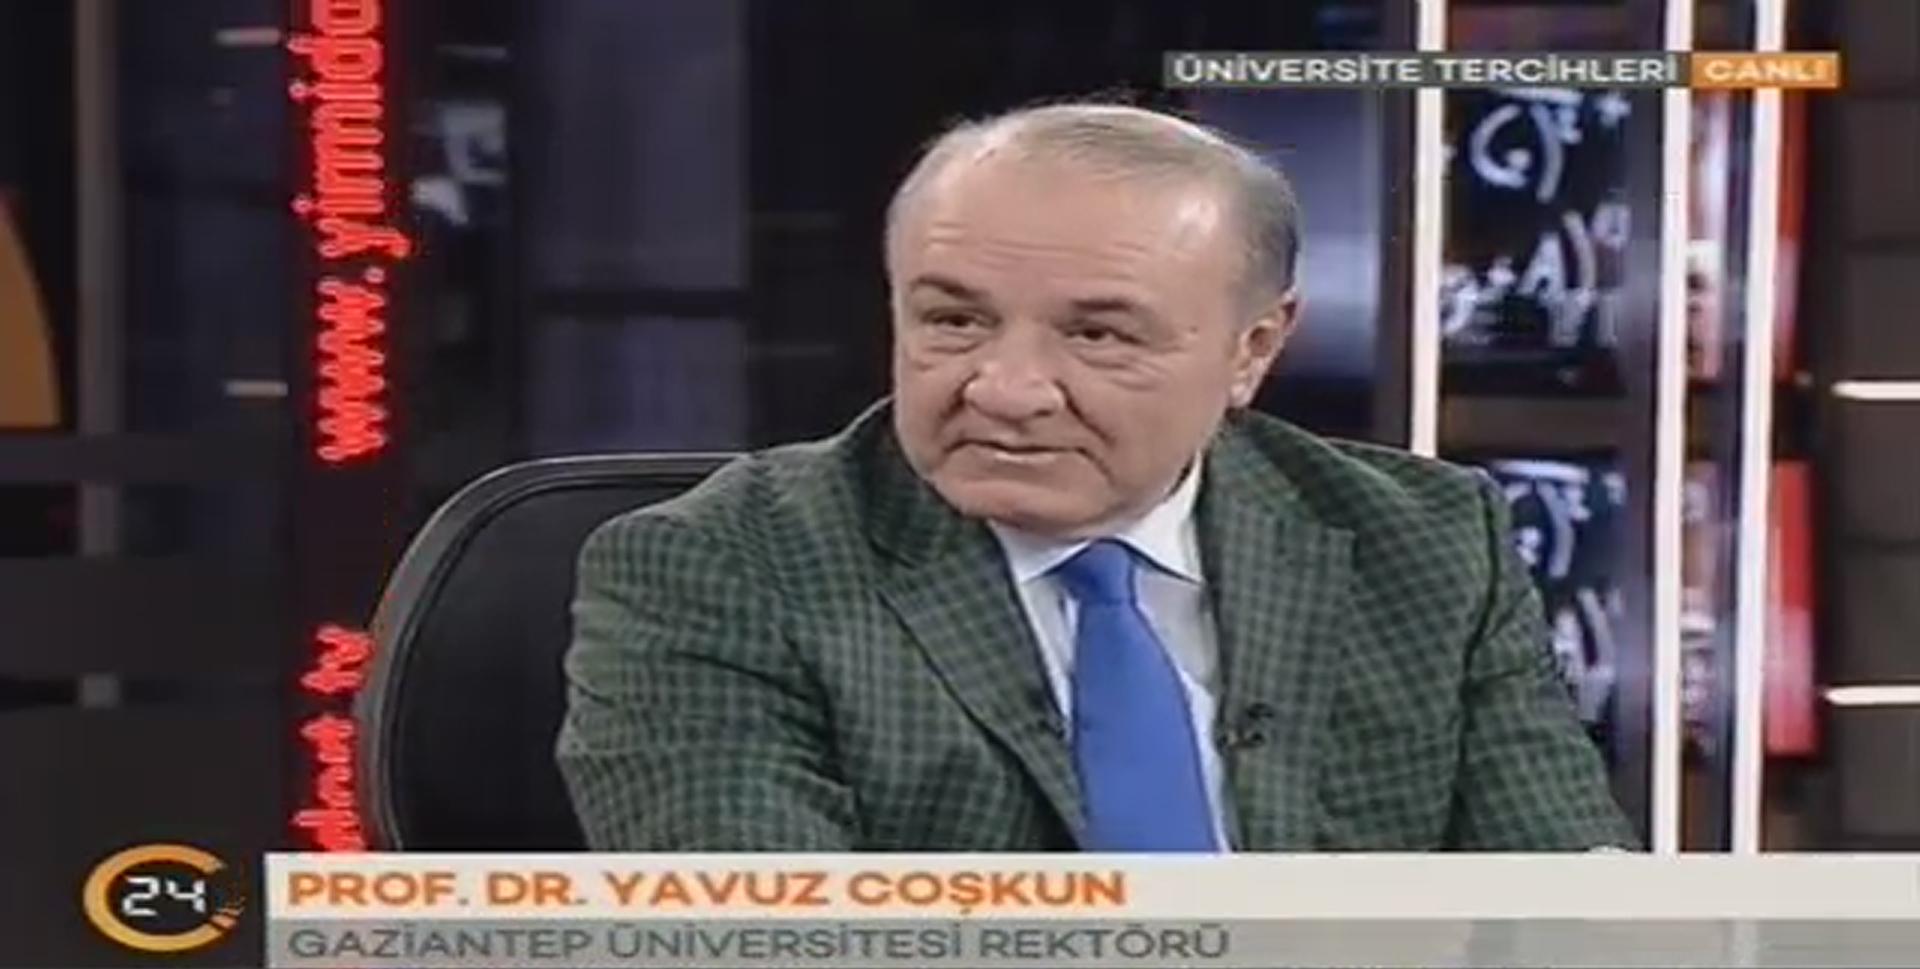 Kanal24 TV